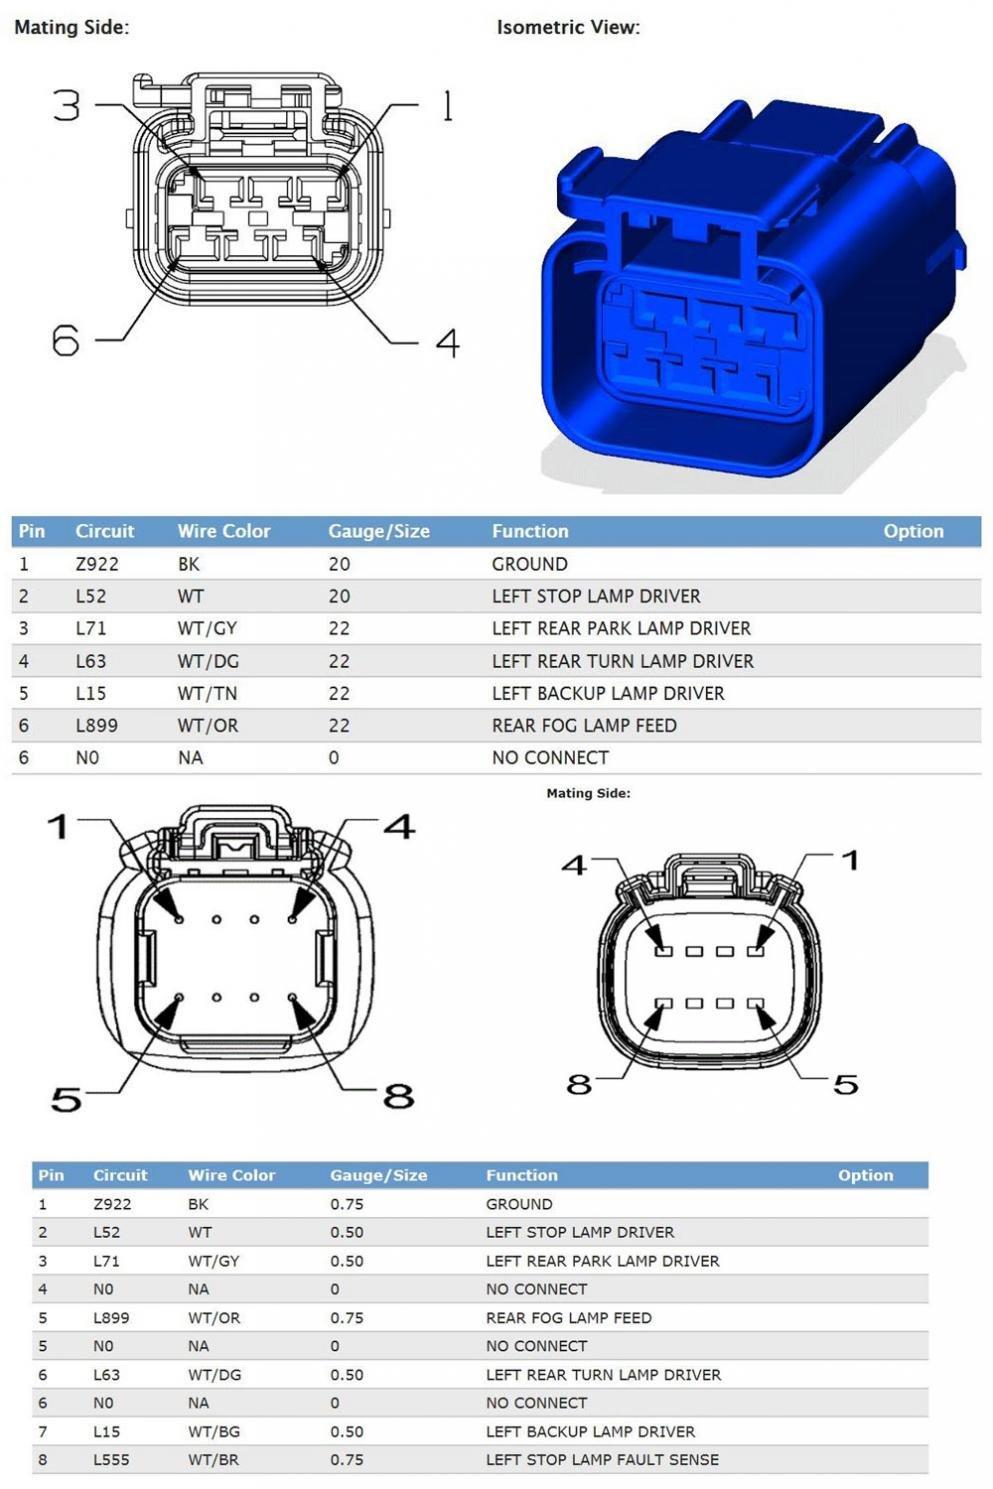 2015 tail light retrofit? | Chrysler 300C & SRT8 ForumsChrysler 300C Forum